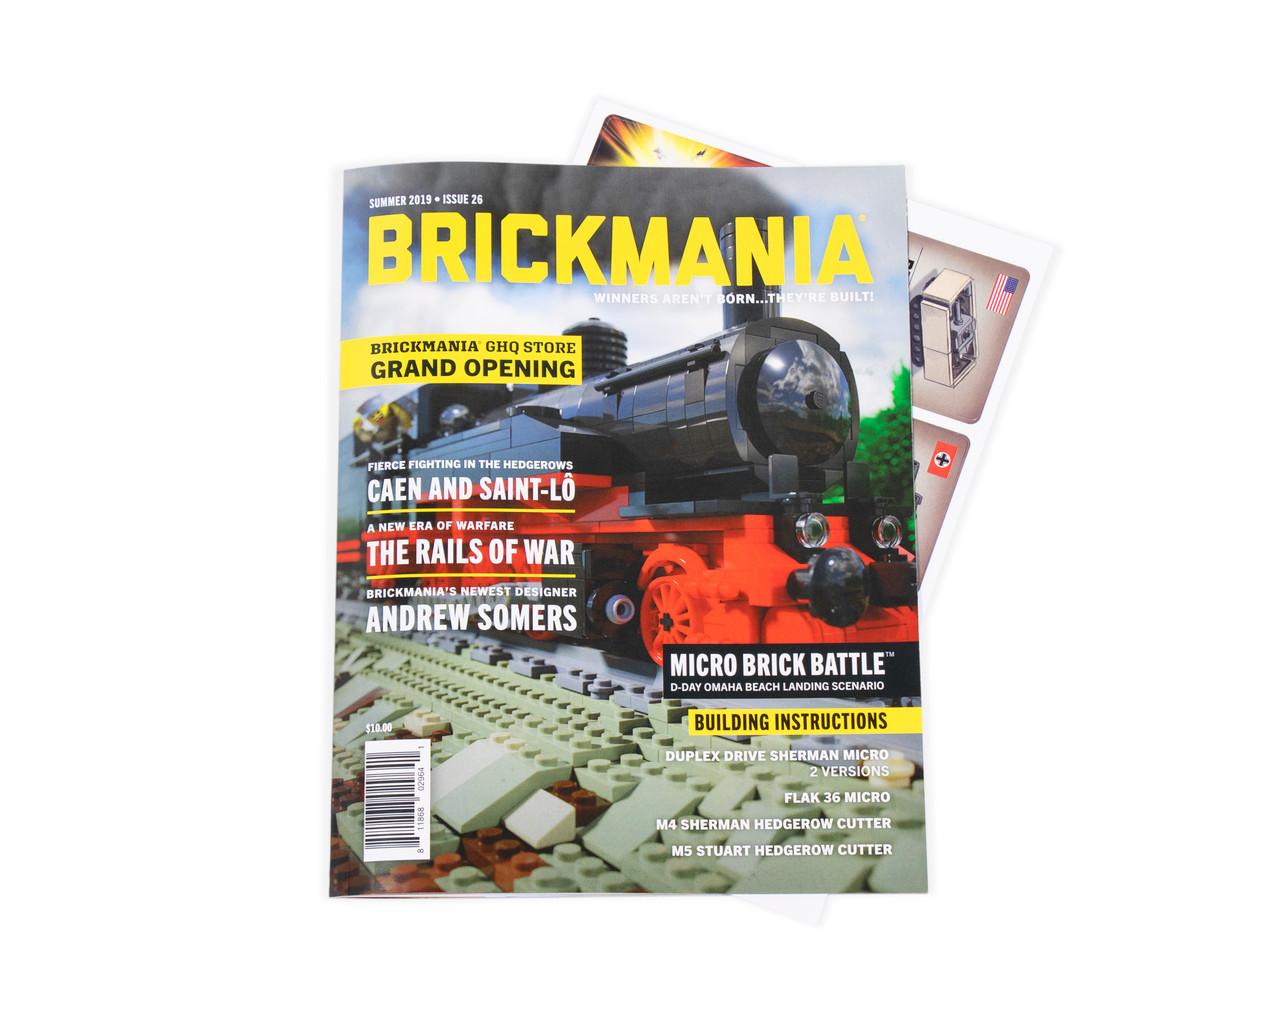 Brickmania Magazine 4-Issue Subscription